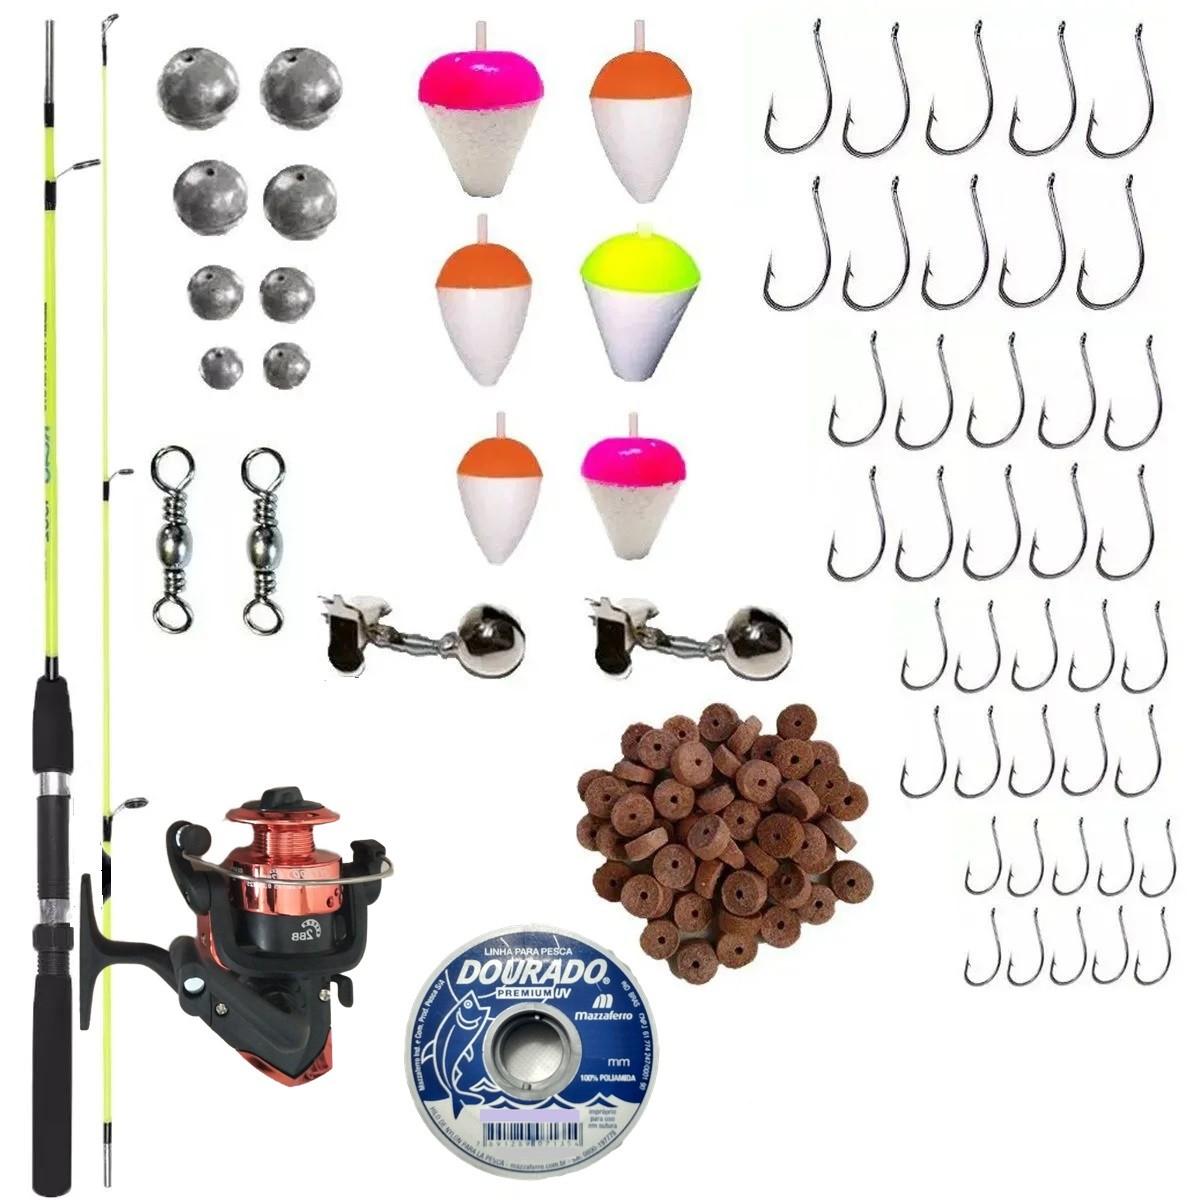 Kit De Pesca Completo 1 Vara 1,50m 1 Molinete  E Itens